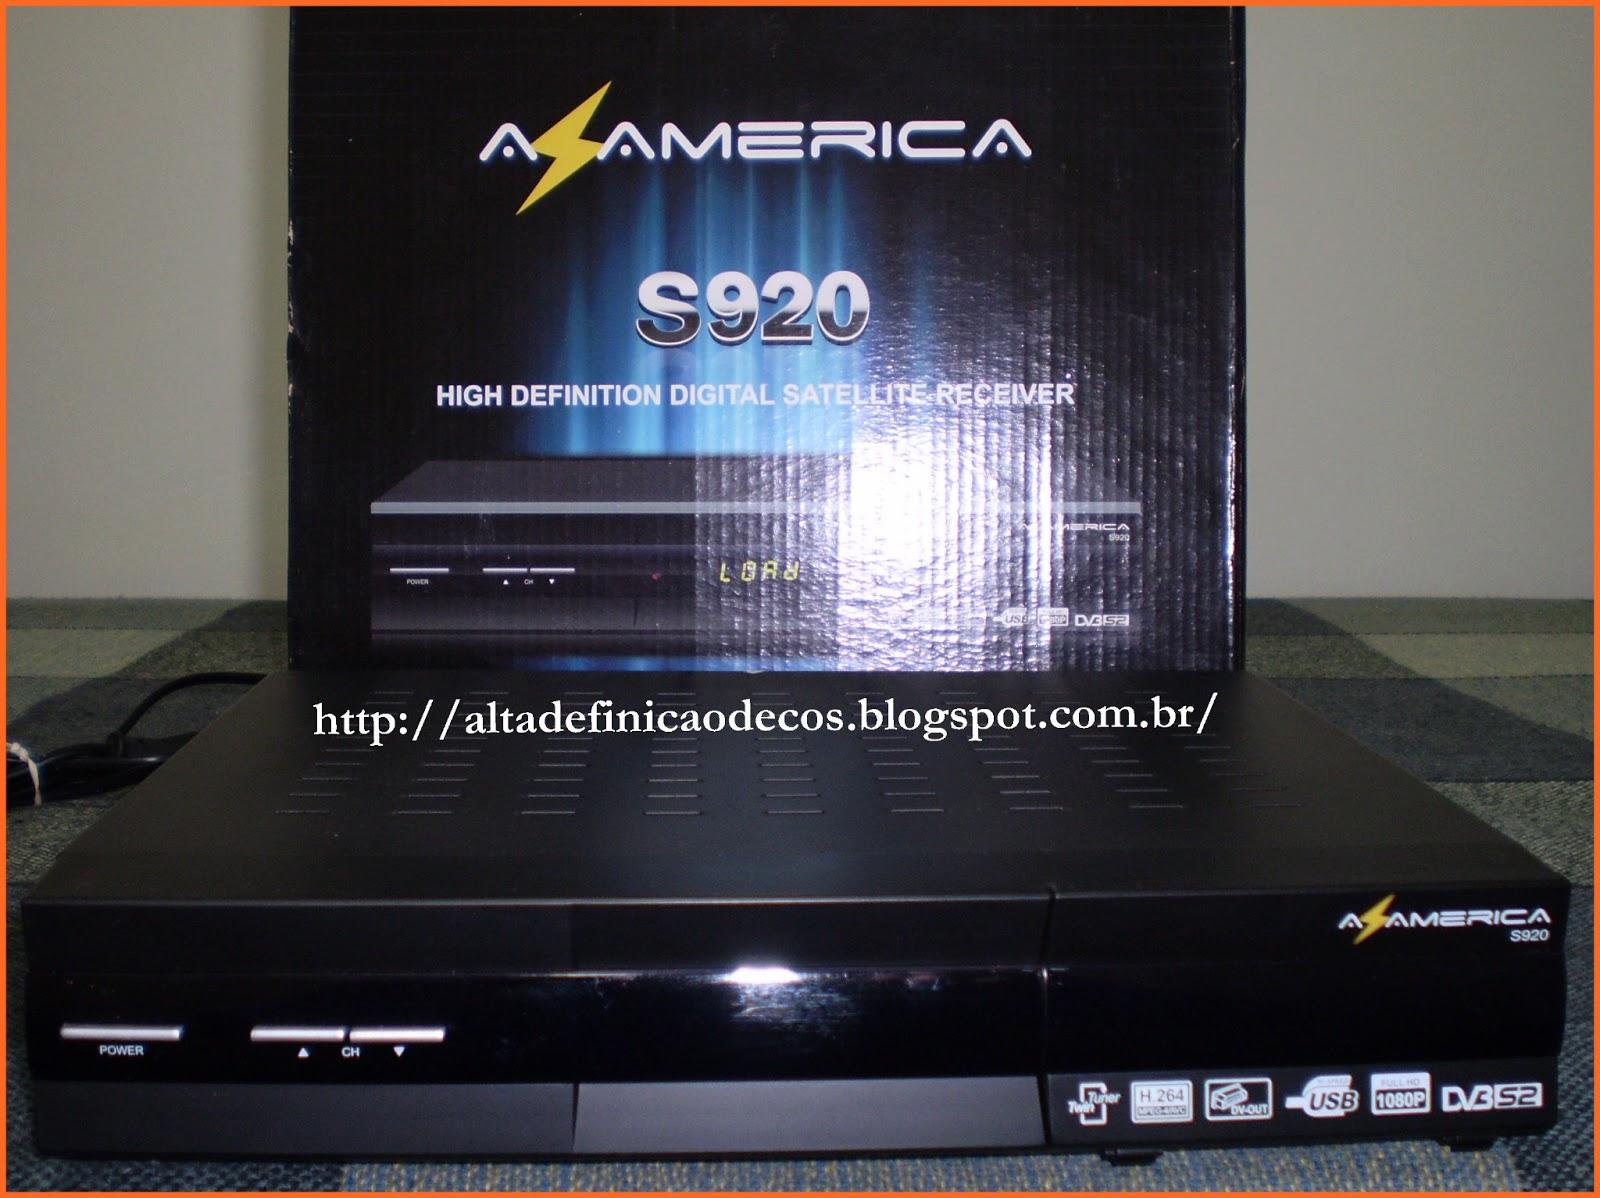 transformar azamerica s920